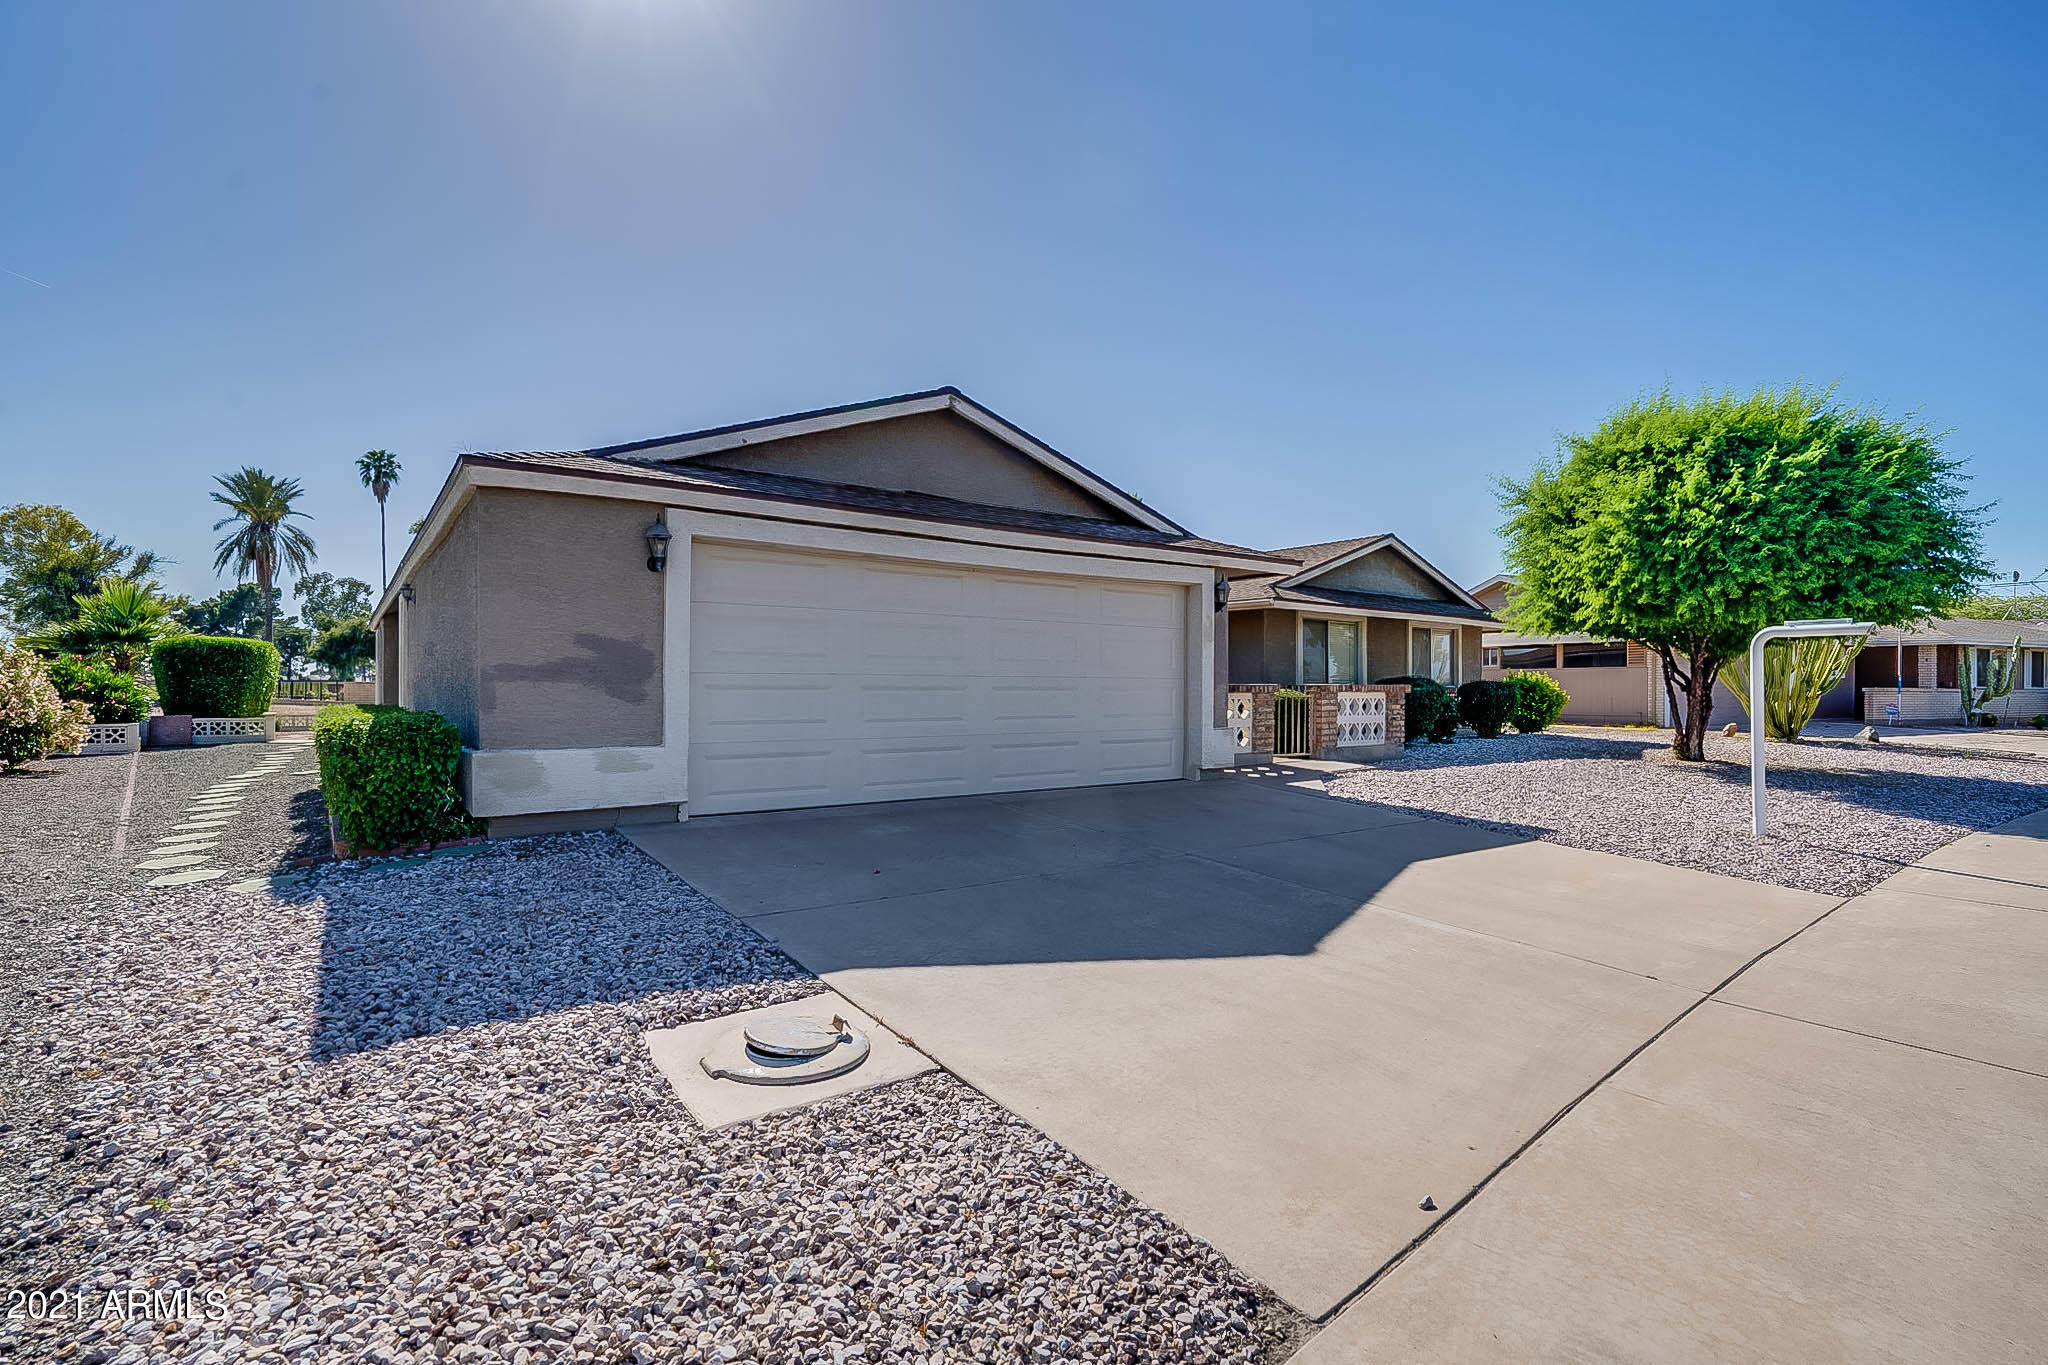 10451 W Wininger Circle, Sun City AZ 85351 - Photo 2